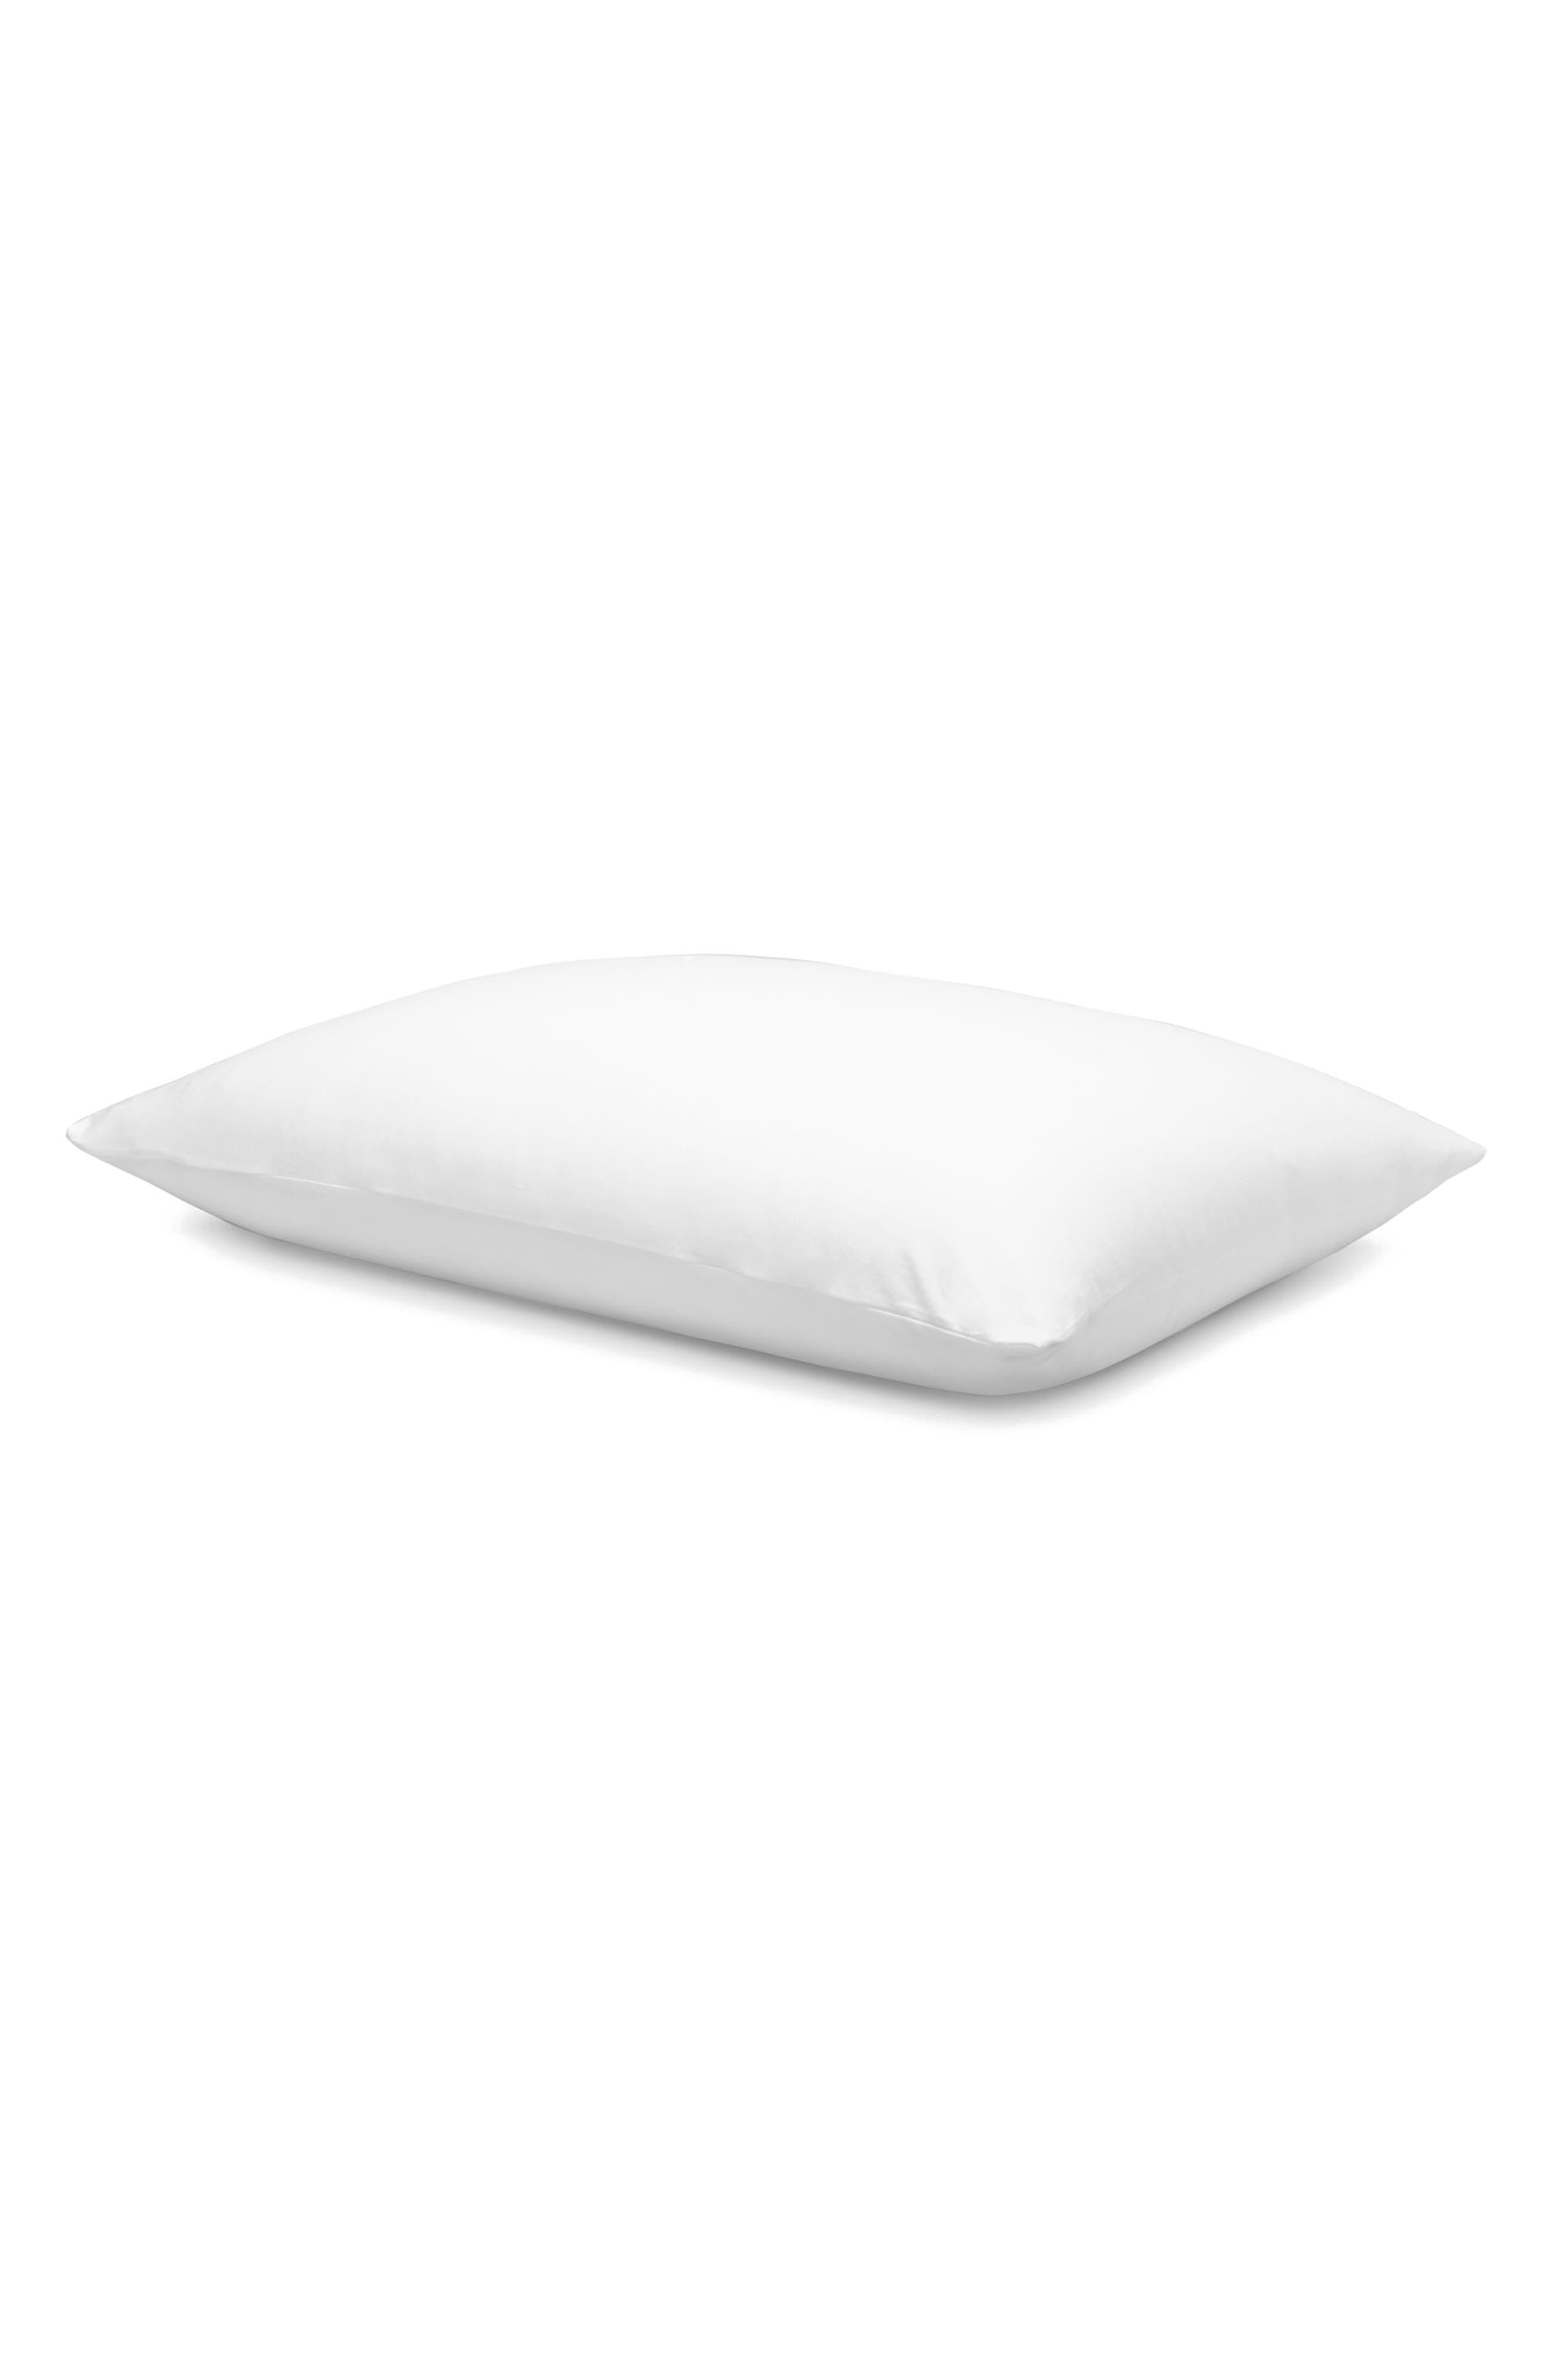 CALVIN KLEIN HOME Harrison Pillowcases, Main, color, WHITE